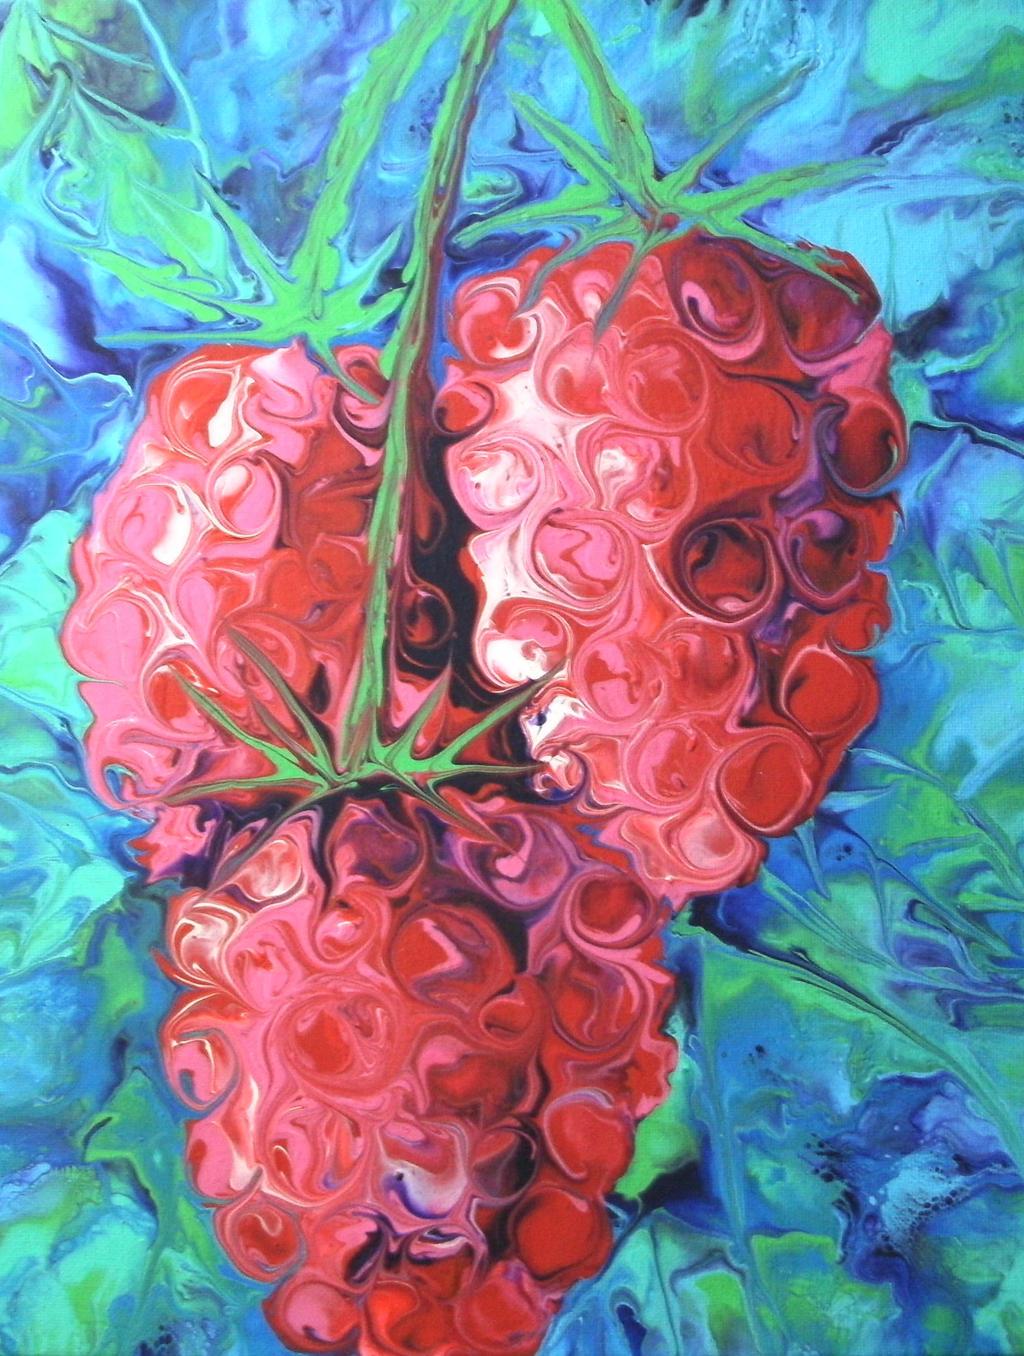 raspberries by anuvys